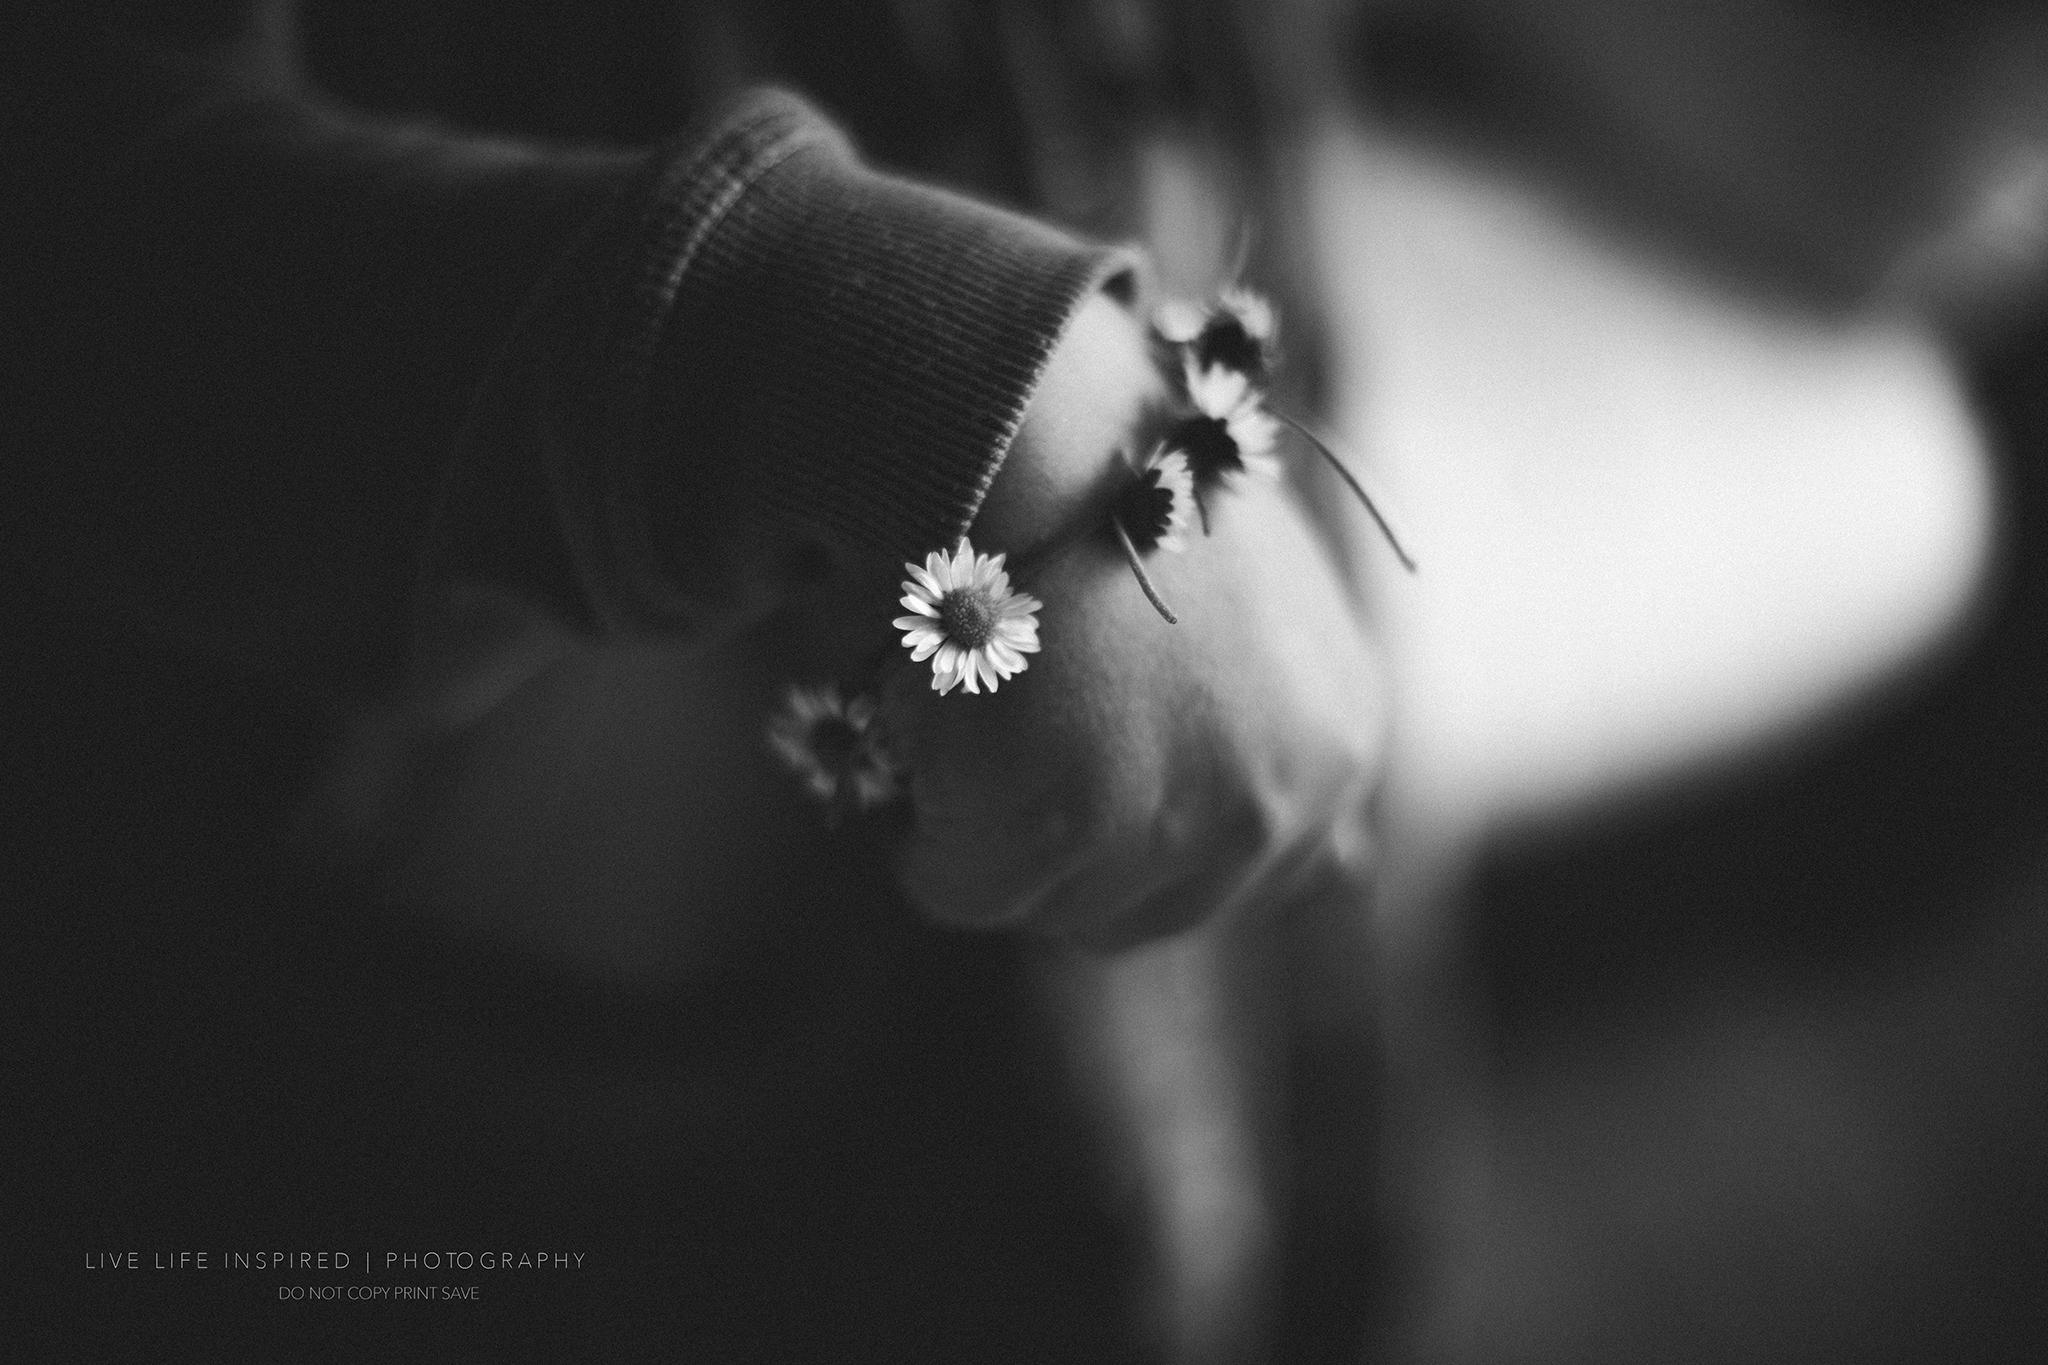 Daisy chains.